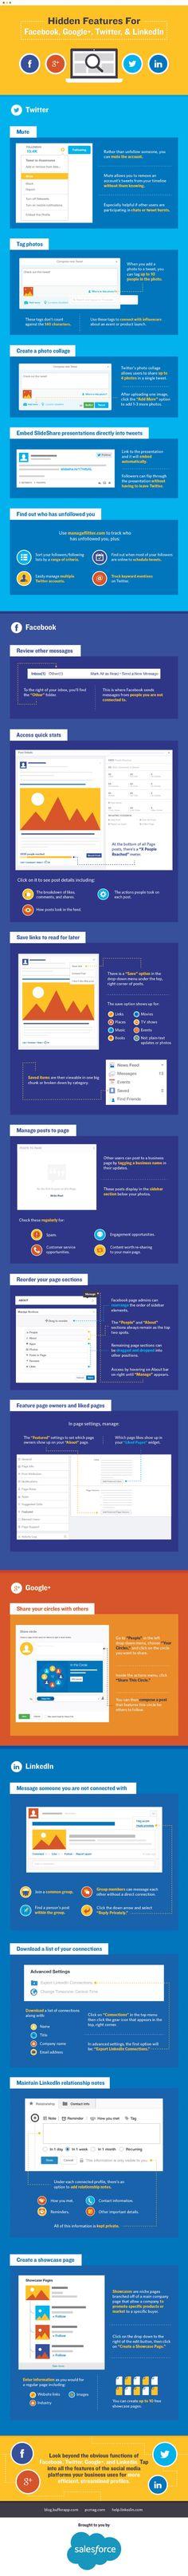 Facebook, Google+, Twitter, LinkedIn Hidden Features (Infographic)